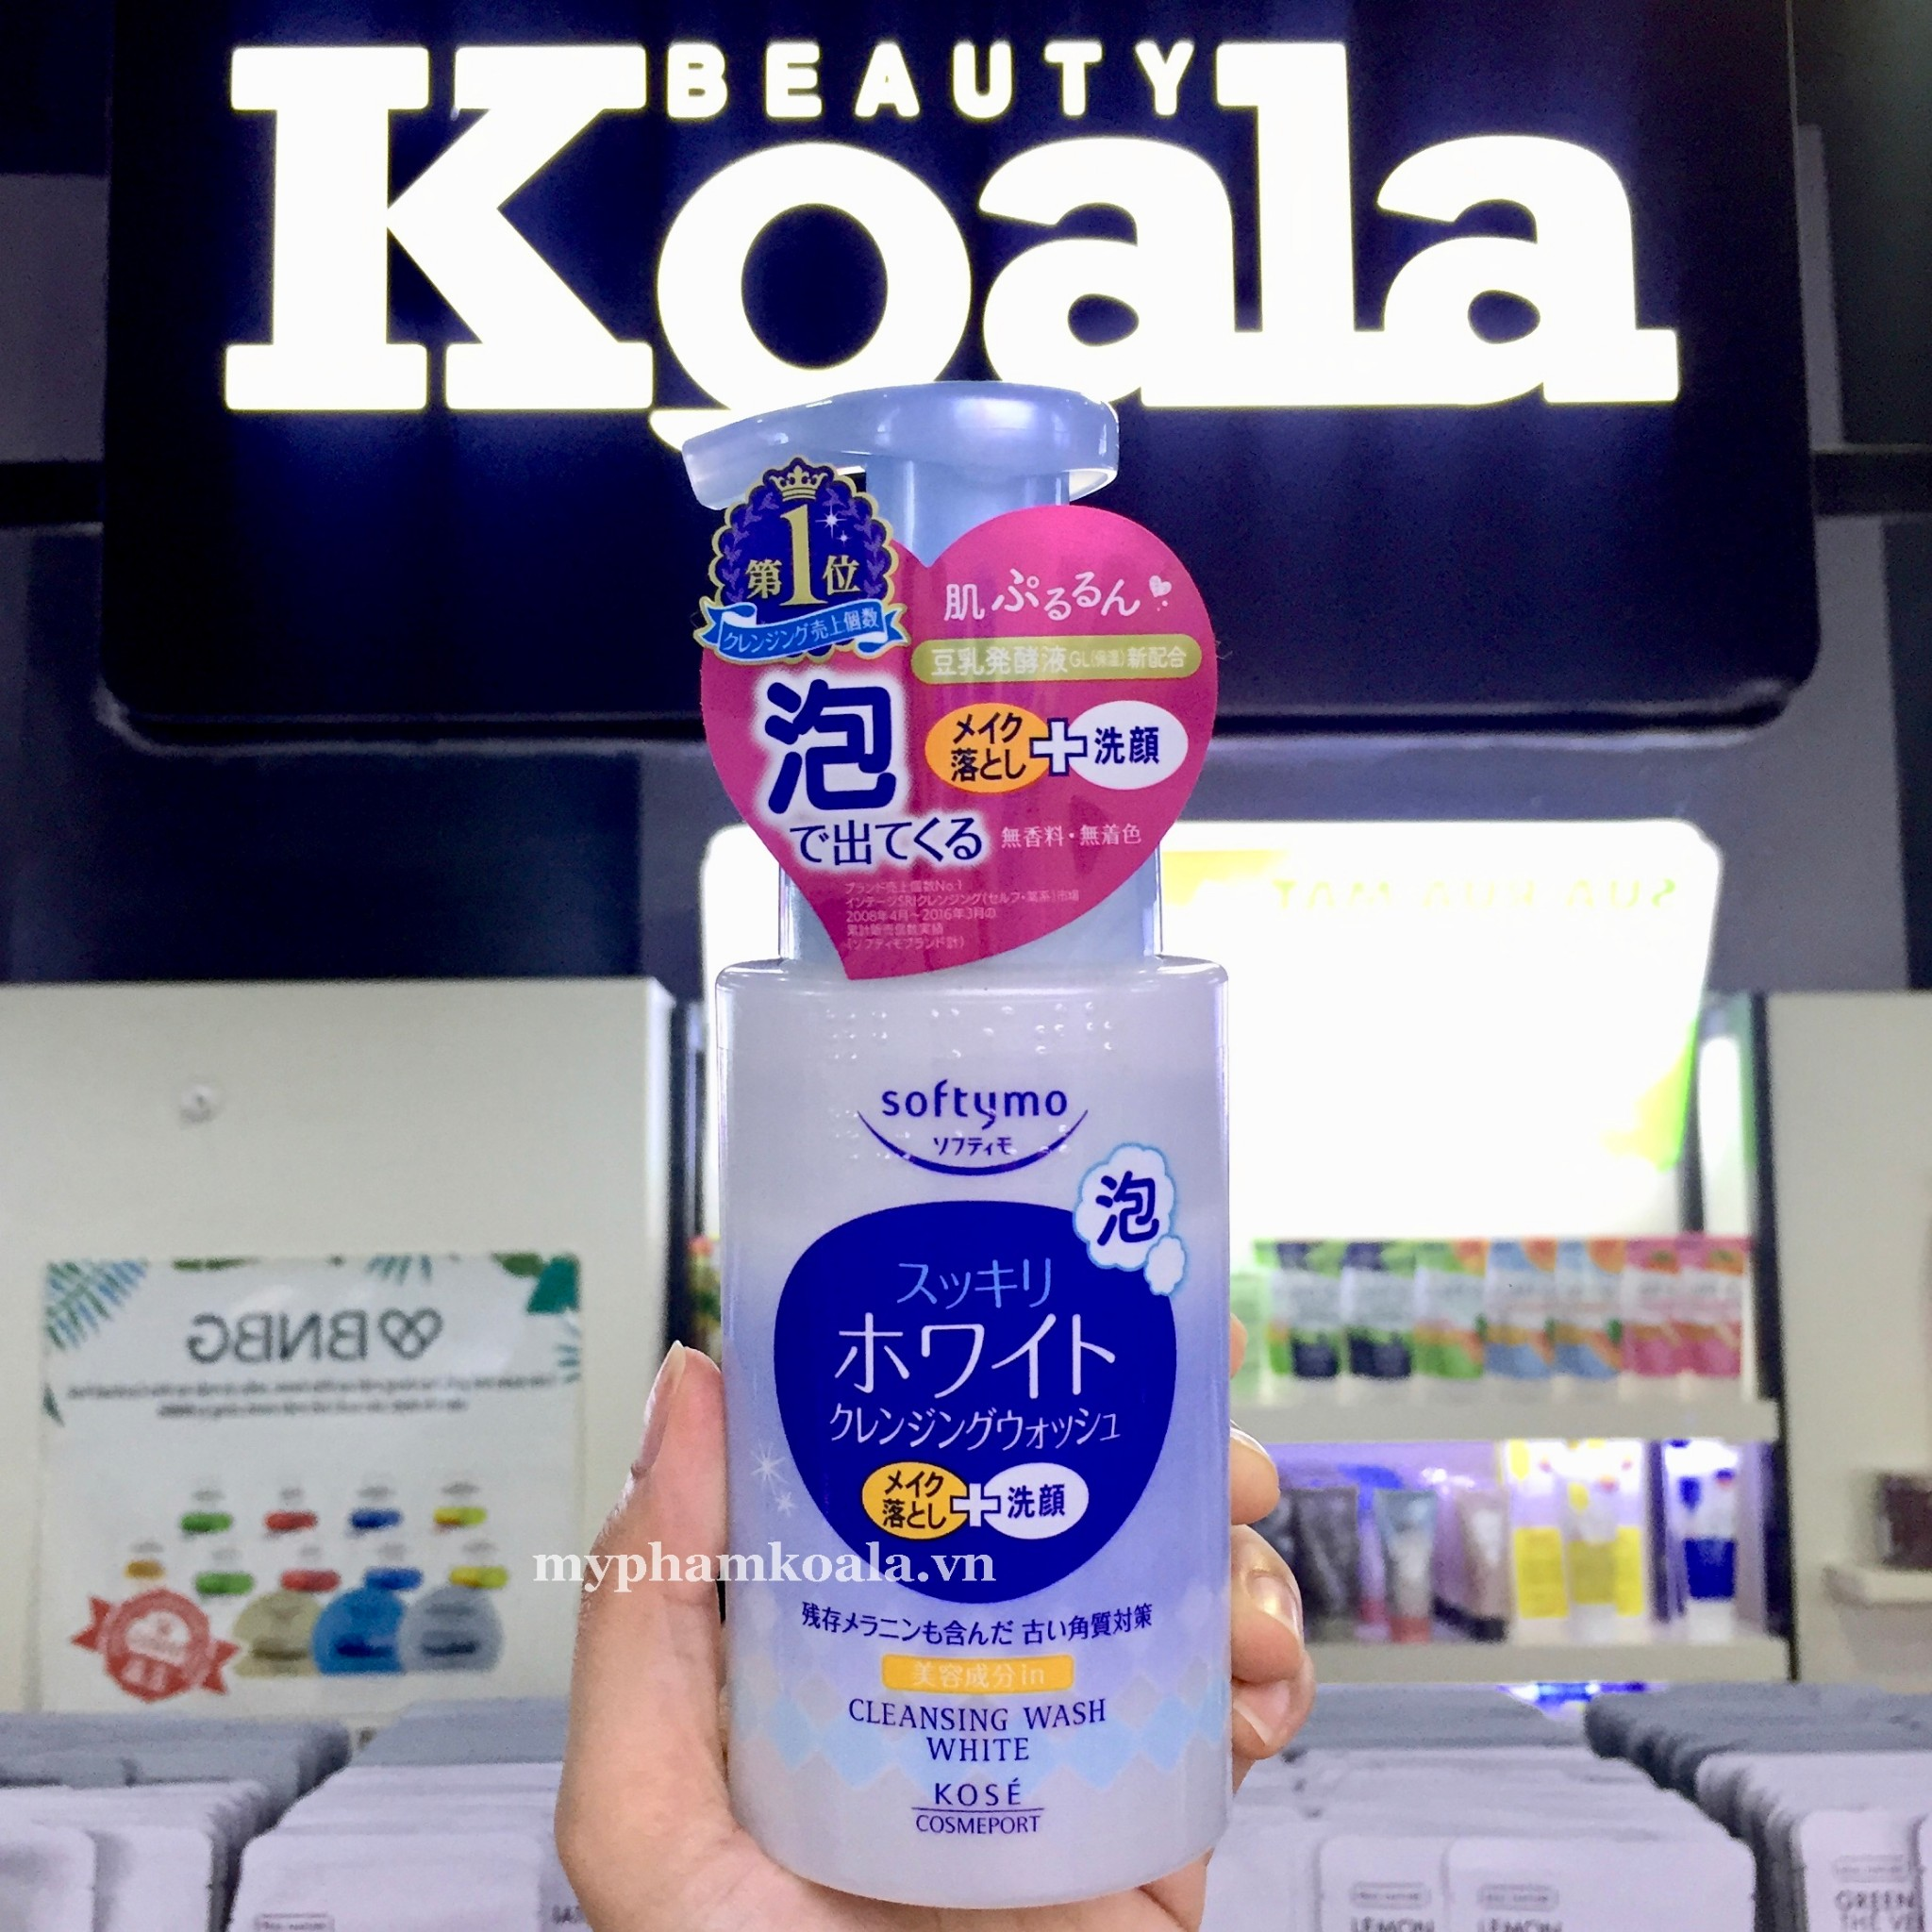 Sữa Rửa Mặt Tạo Bọt Trắng Da Kose Softymo Cleansing Wash White 200ml